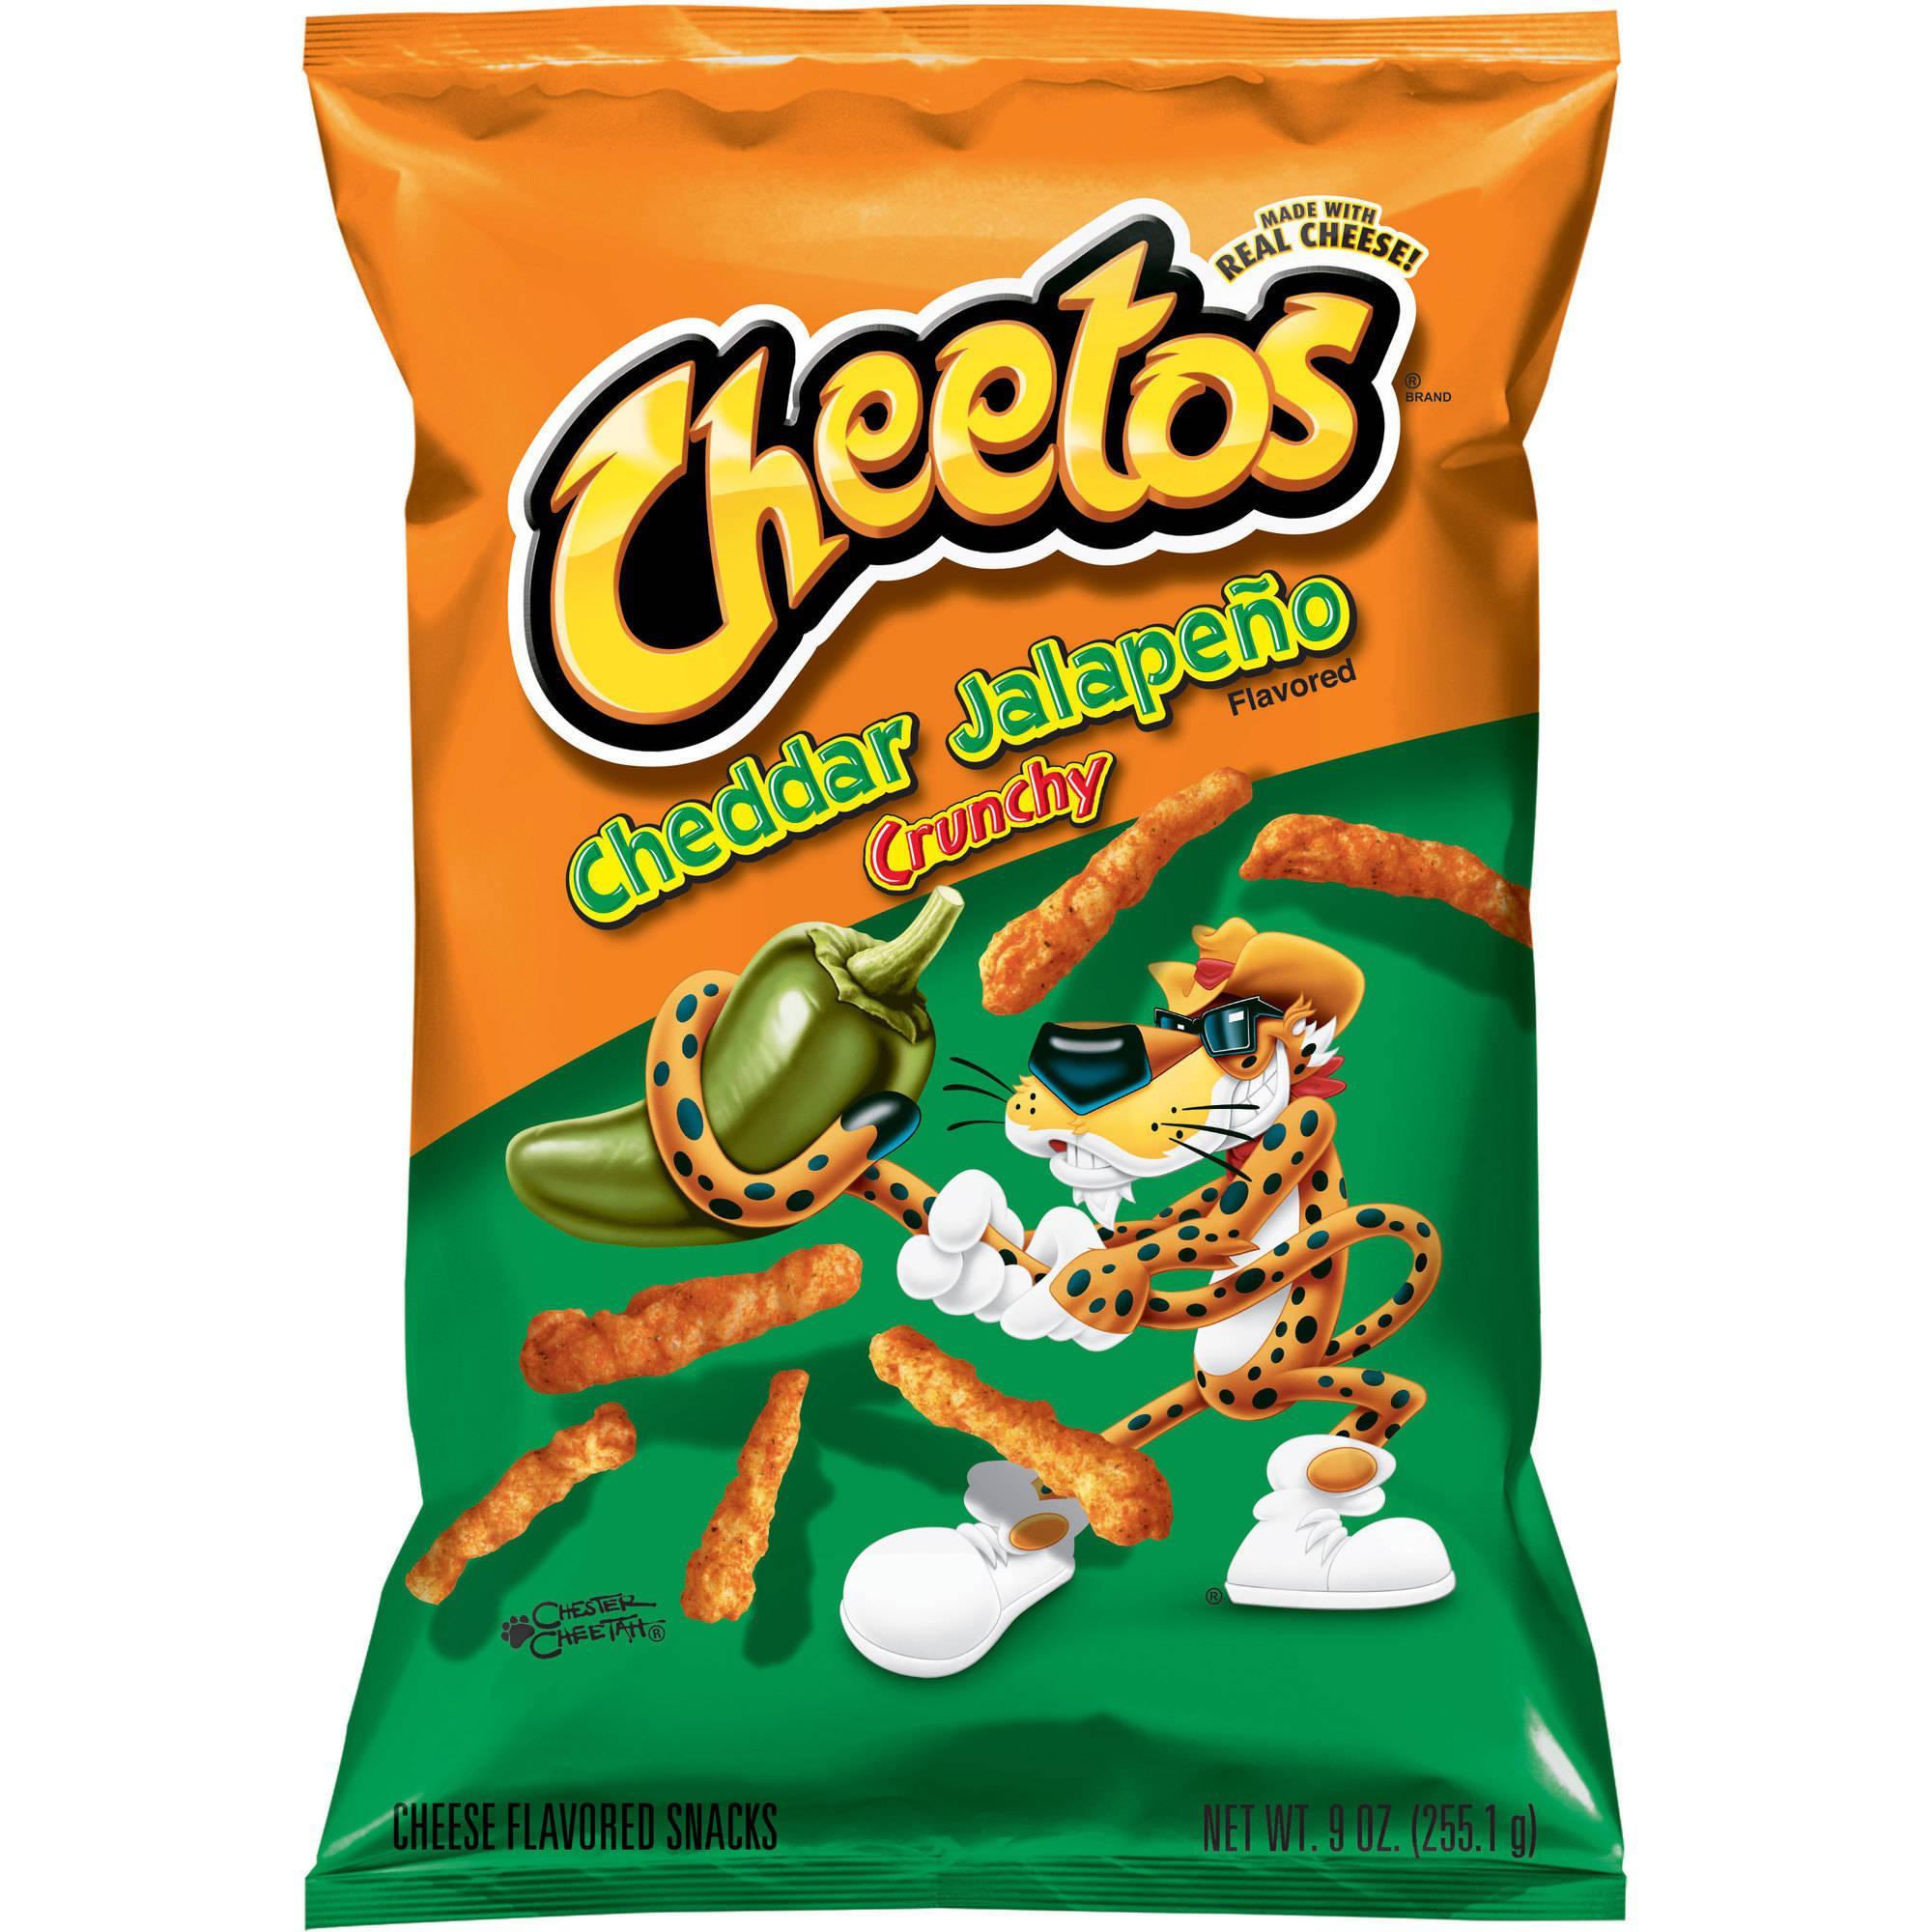 Cheetos clipart crunchy cheese Flavored  0 9 Crunchy